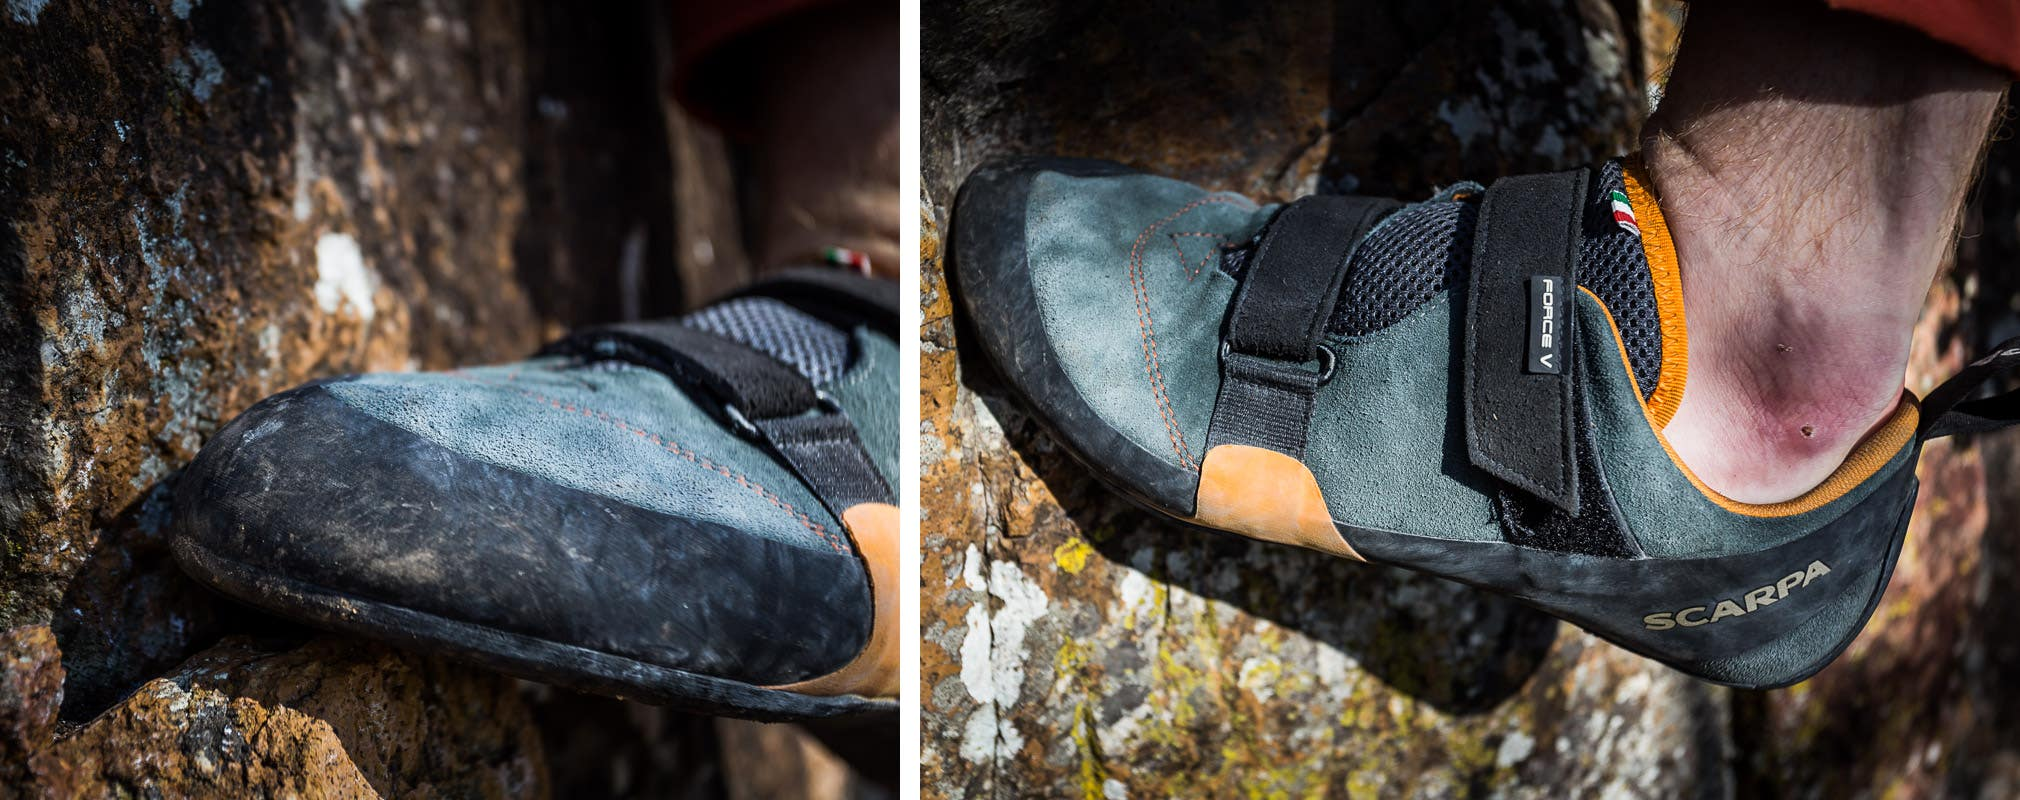 Review: Scarpa Force V Shoe   Paddy Pallin